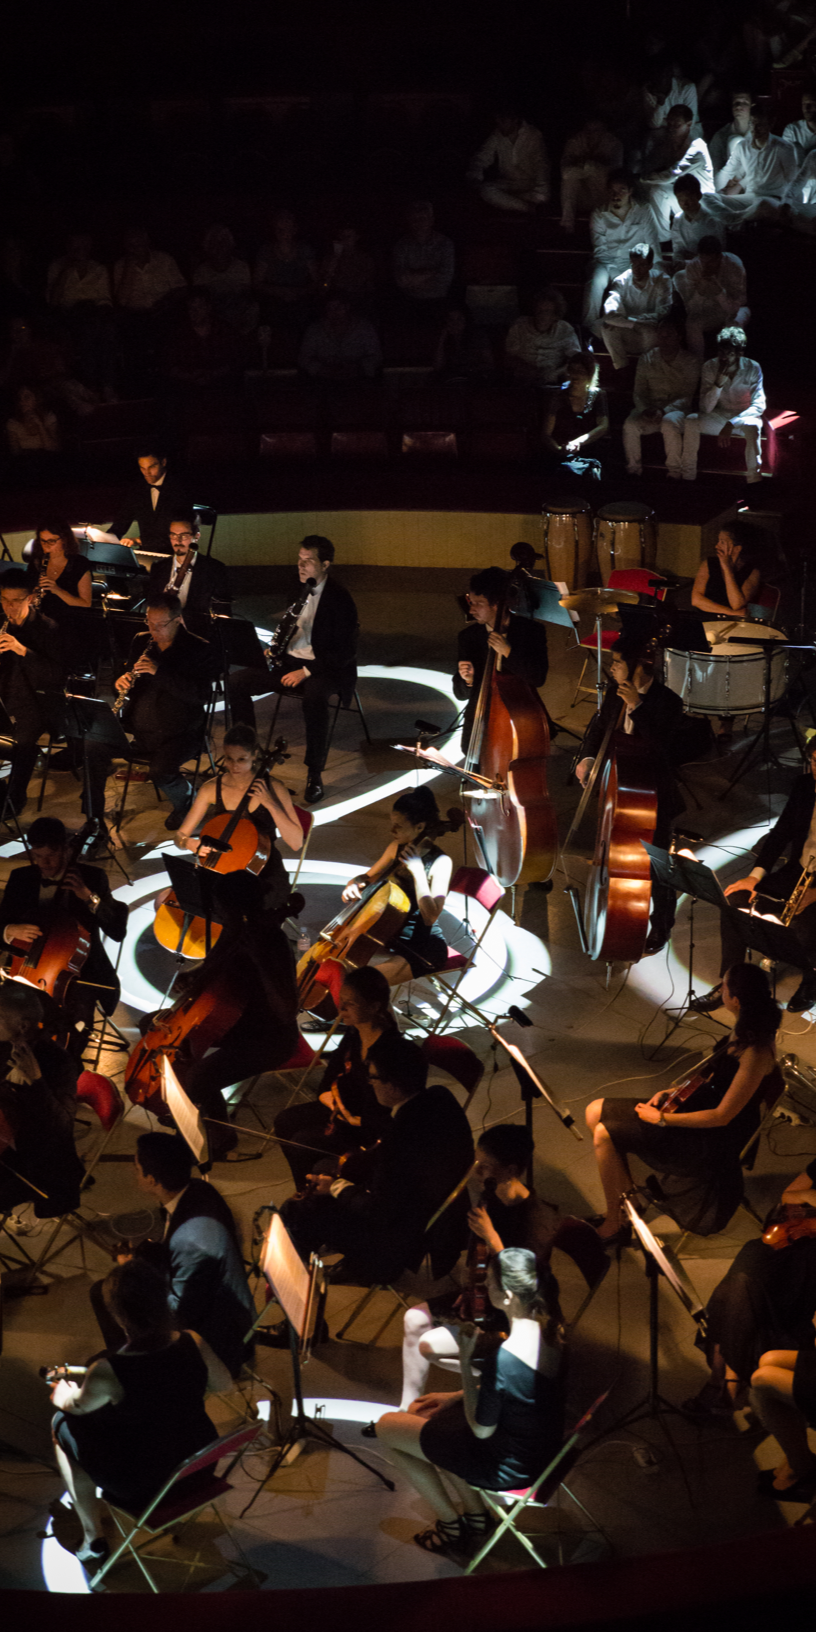 Orchestre@2x